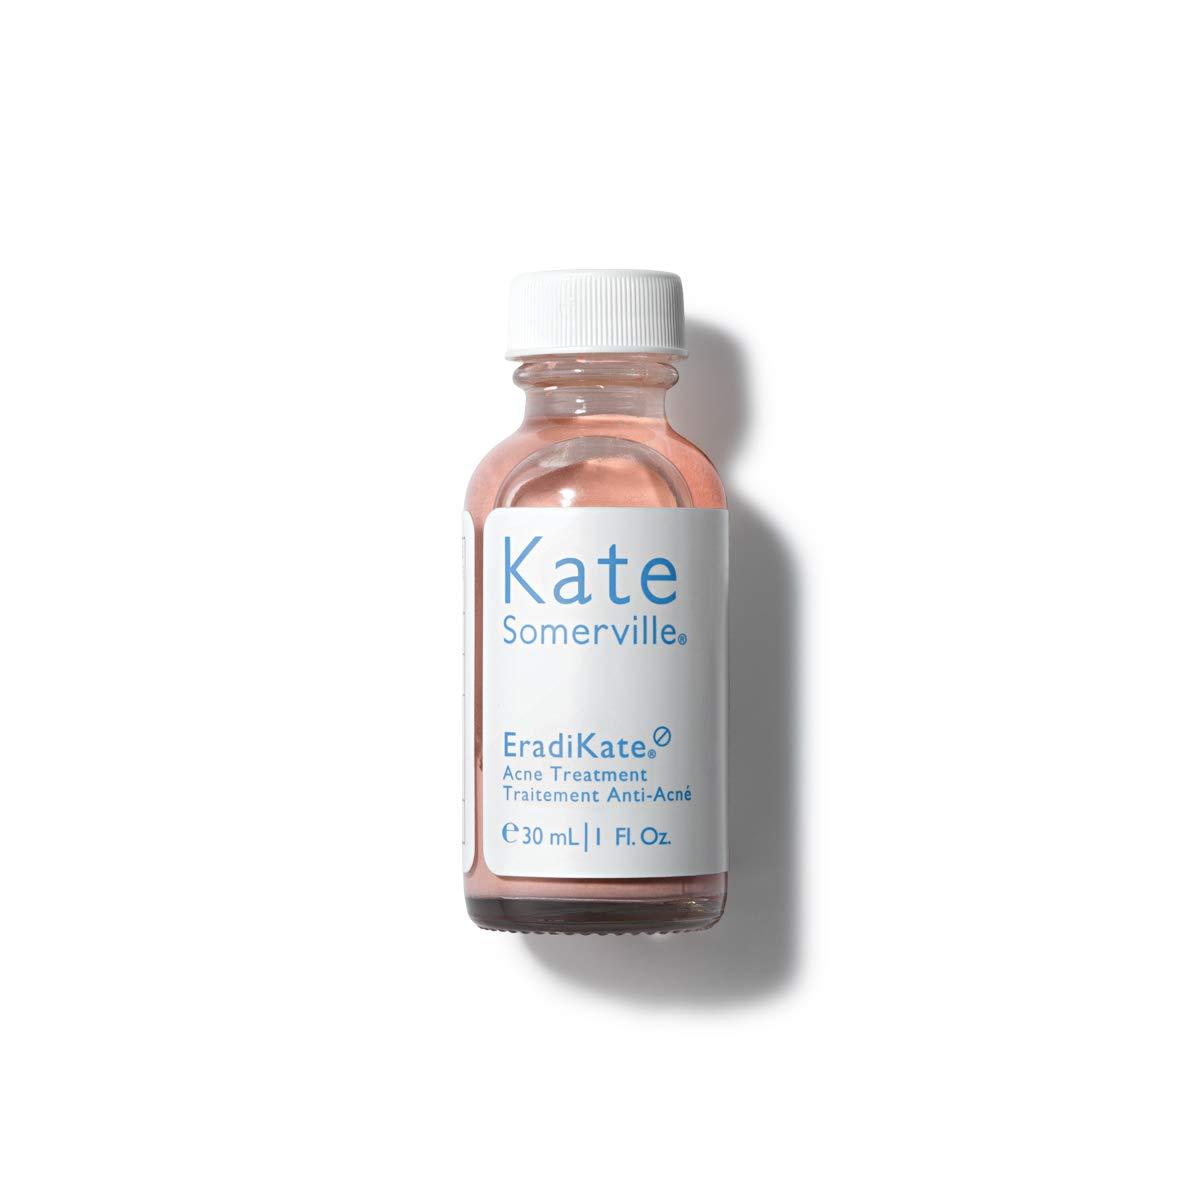 Kate Somerville EradiKate Acne Treatment - Sulfur Treatment - Acne Spot Treatment (1 Fl. Oz. US) by Kate Somerville